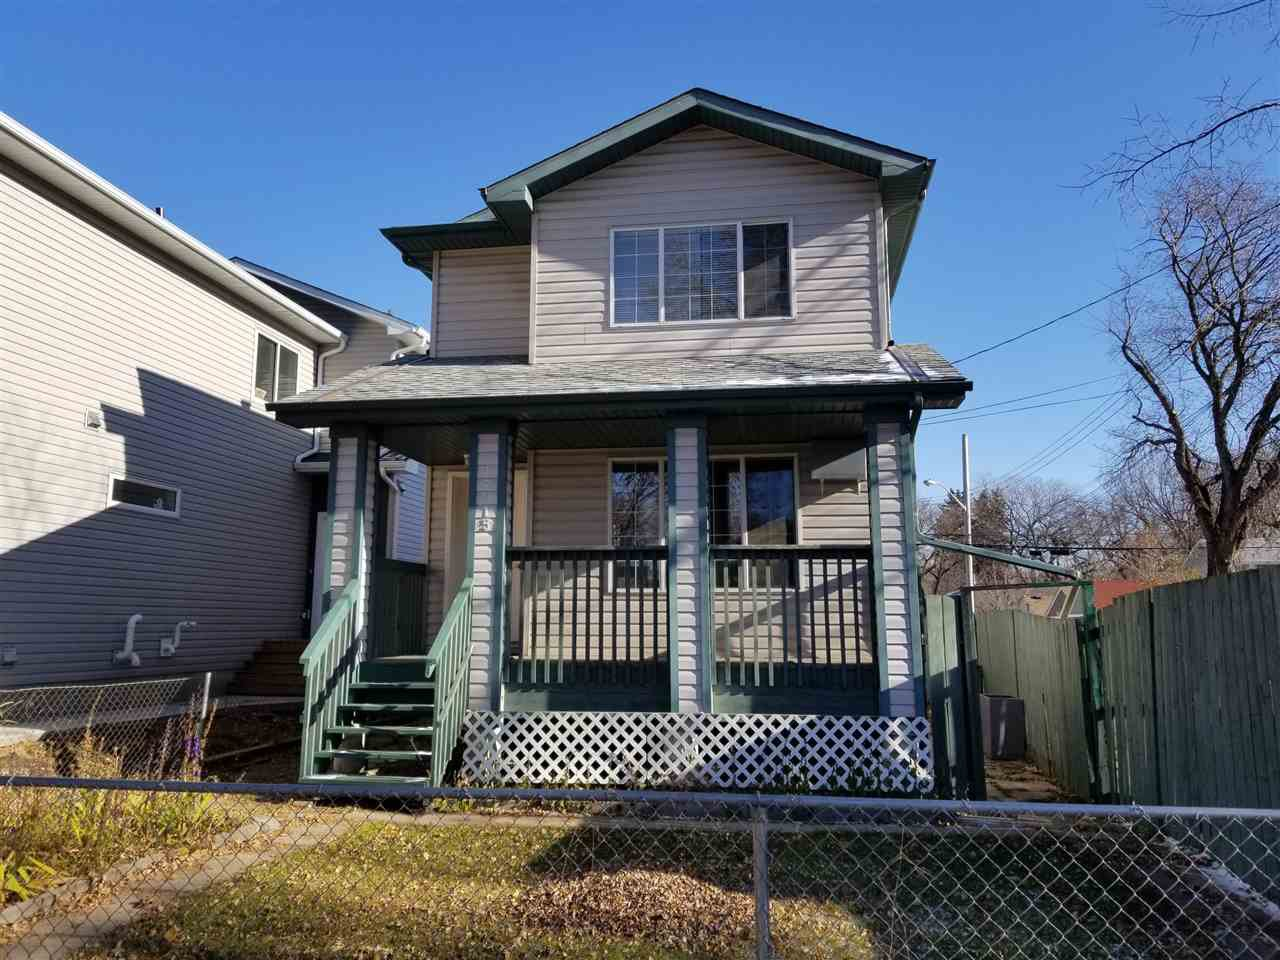 Main Photo:  in Edmonton: Zone 05 House for sale : MLS®# E4178608